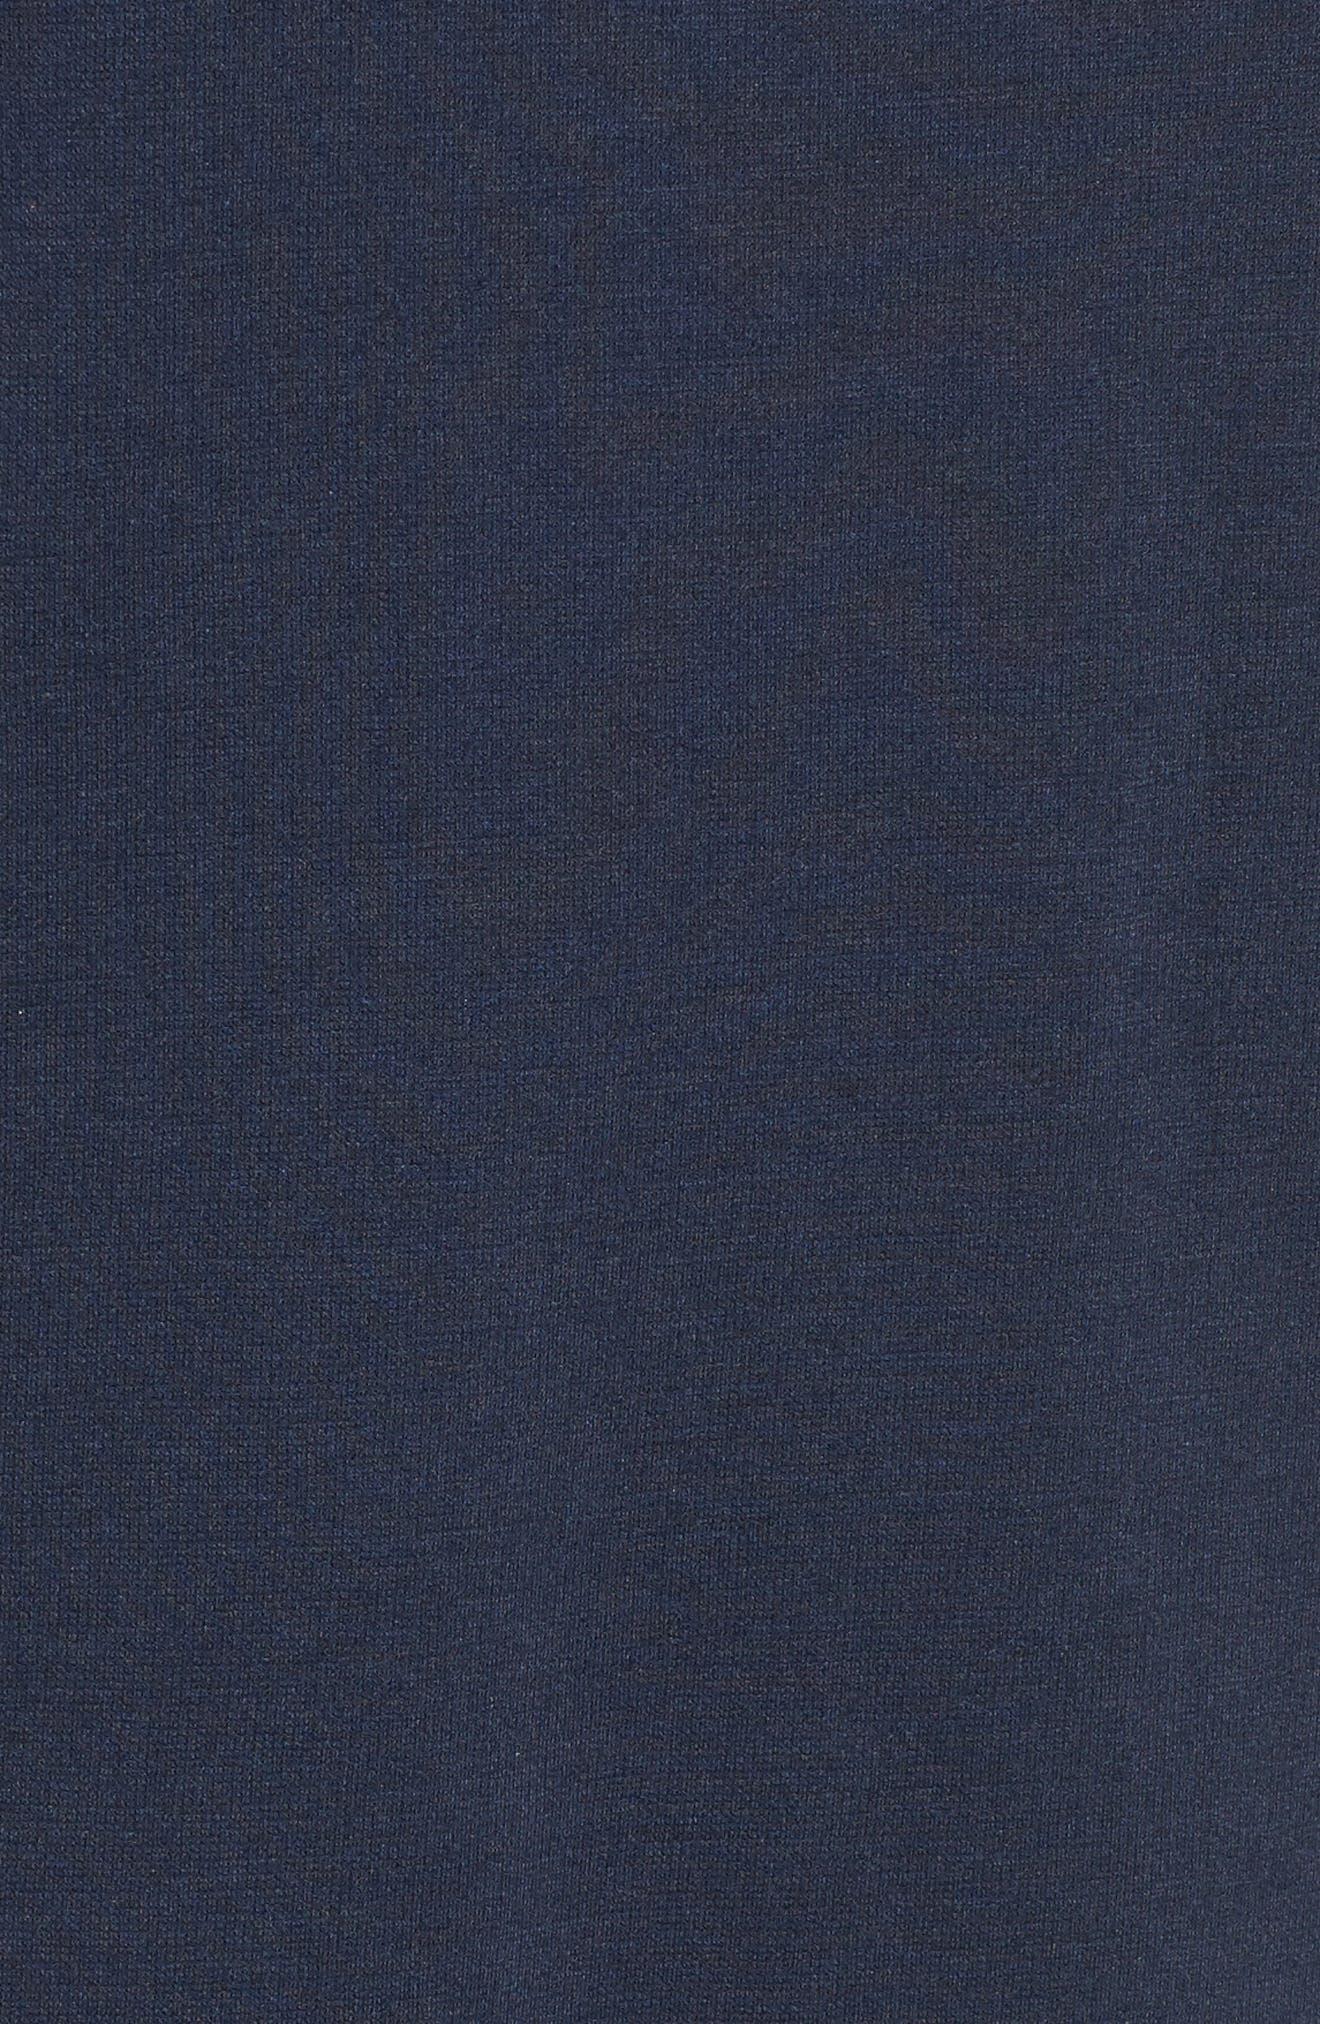 Ruffle Sleeve Shift Dress,                             Alternate thumbnail 5, color,                             Navy